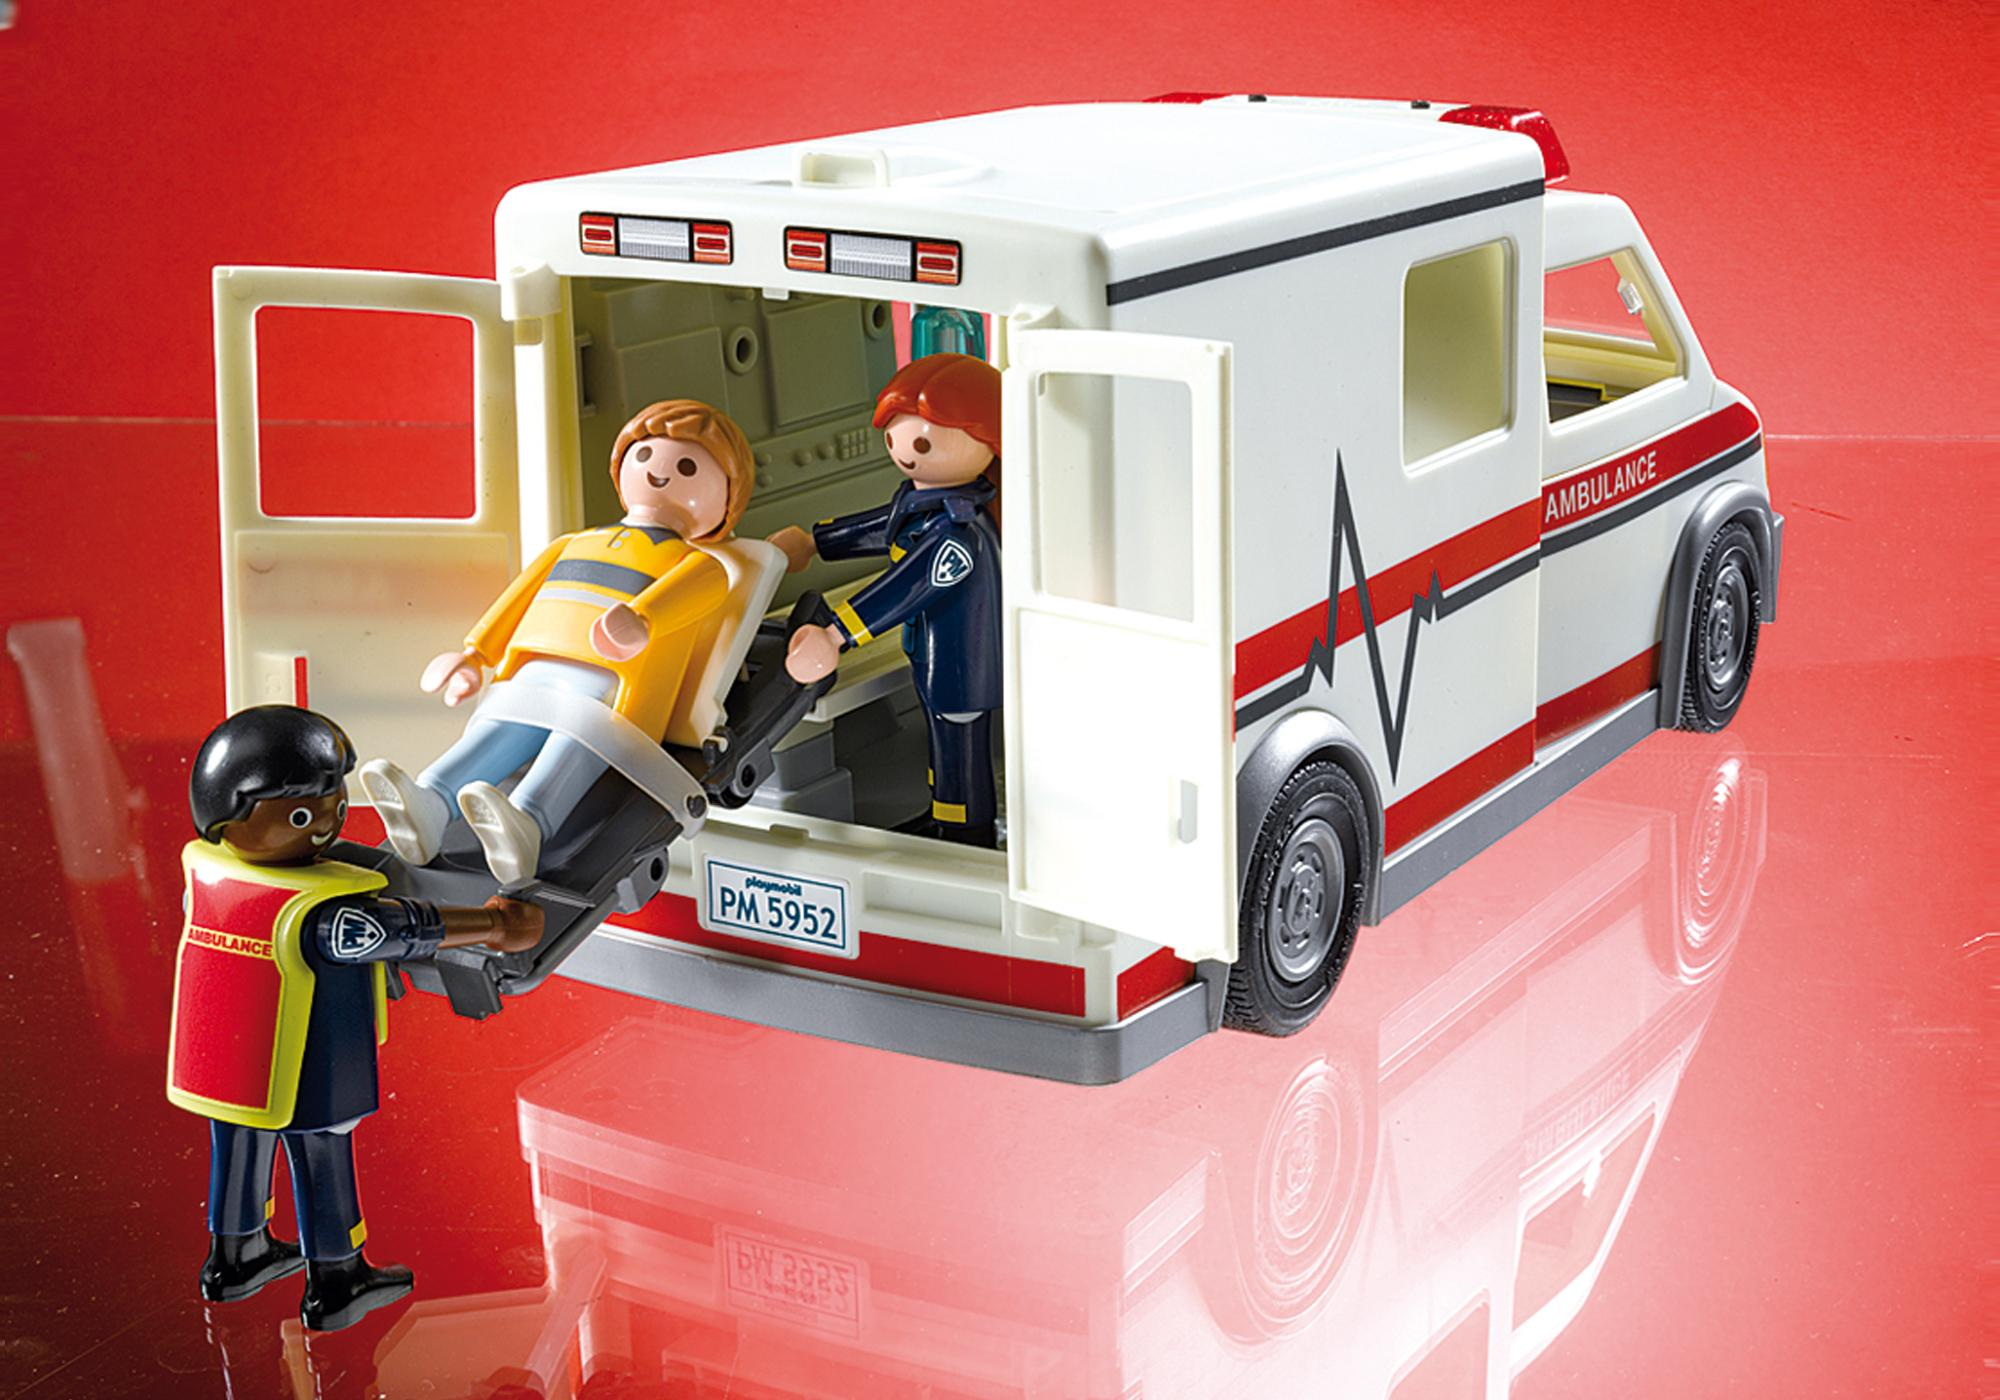 http://media.playmobil.com/i/playmobil/5681_product_extra2/Rescue Ambulance